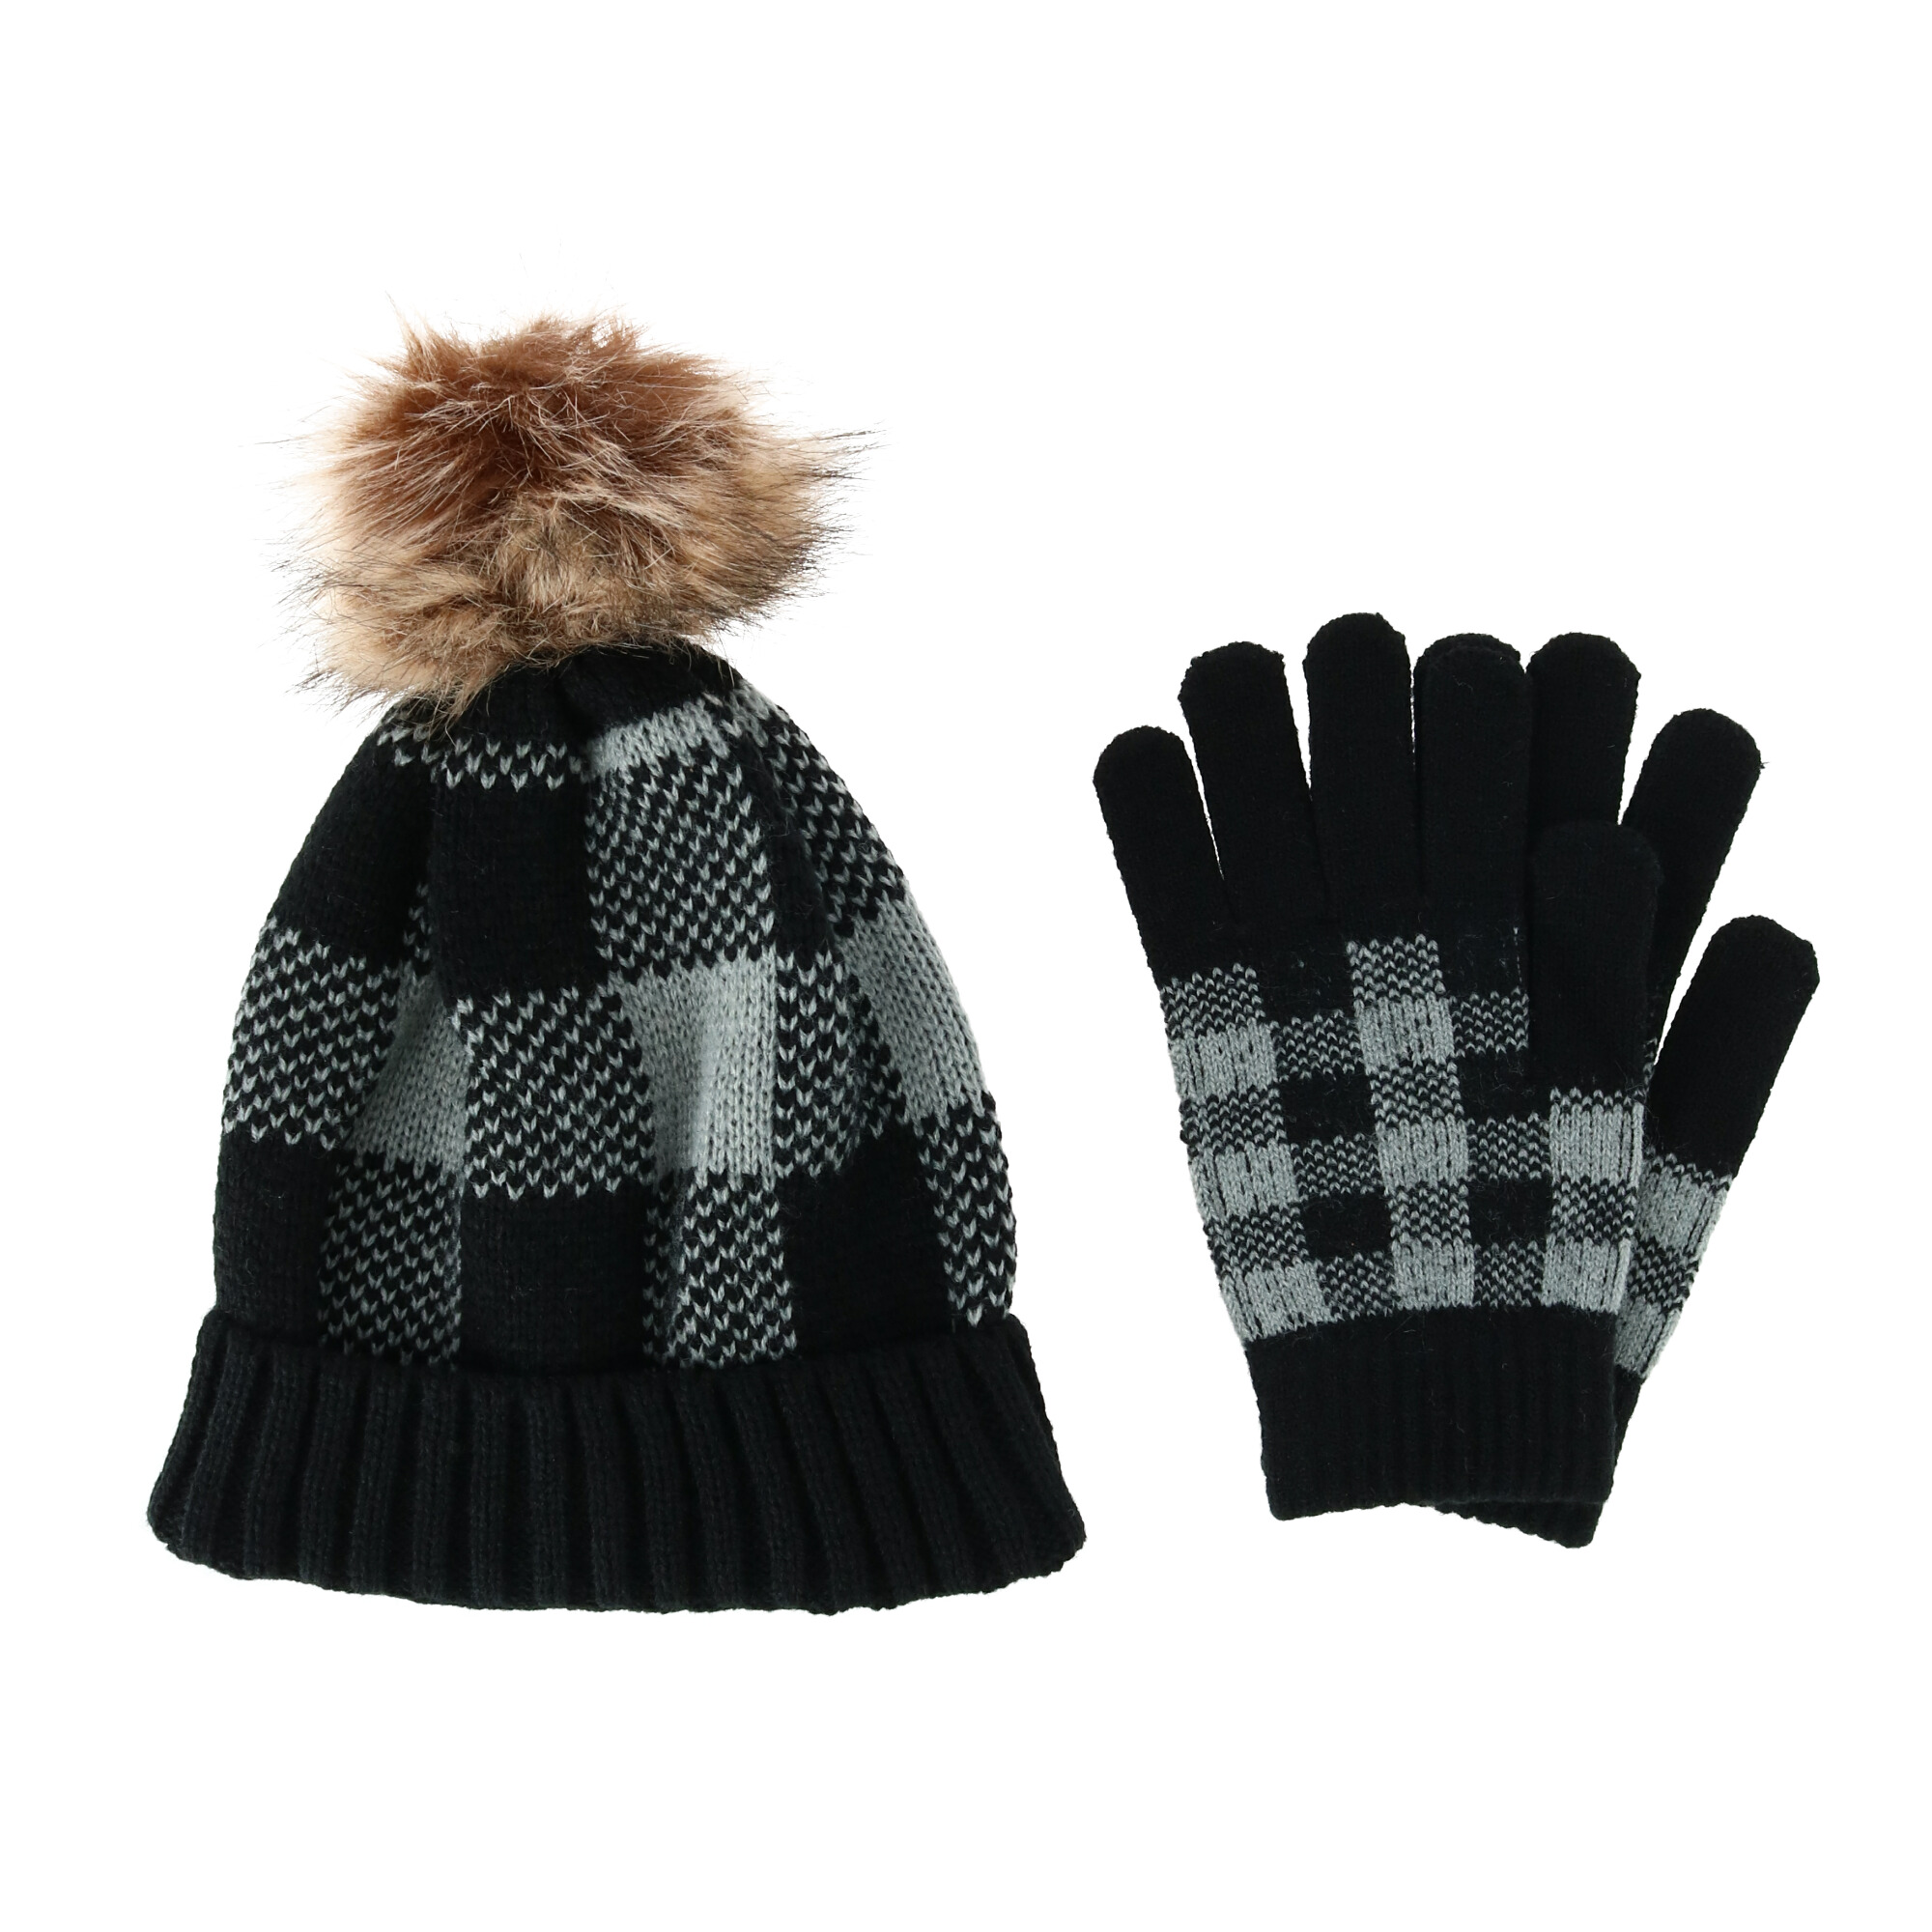 Clear Creek Women's Buffalo Plaid Beanie and Glove Winter Set - Grey